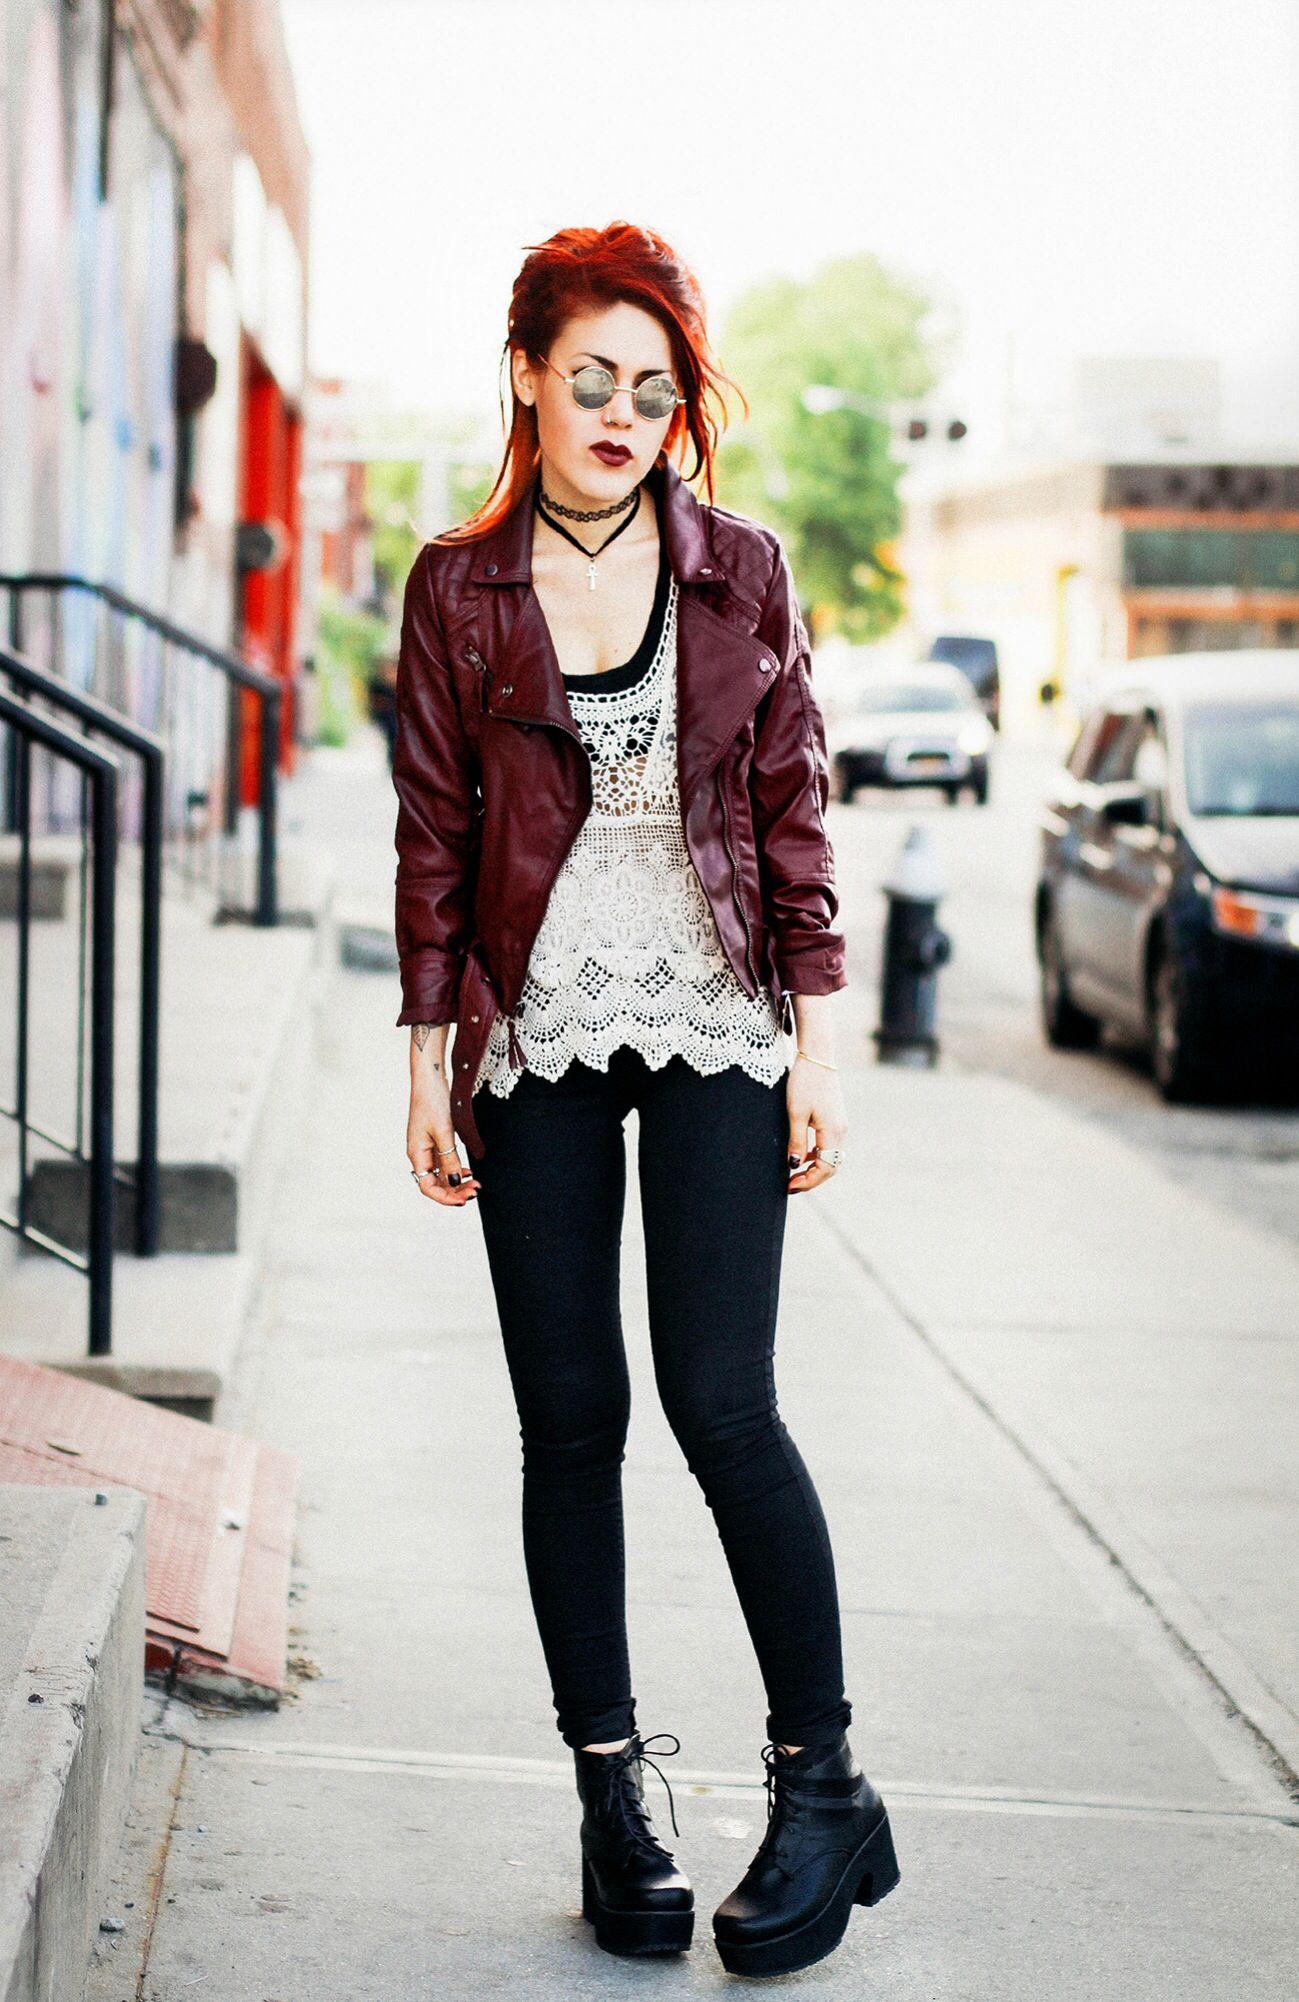 #luana #blogger #grunge #style #fashion #hair #biuri | Trajes grunge. Estilo grunge. Trajes